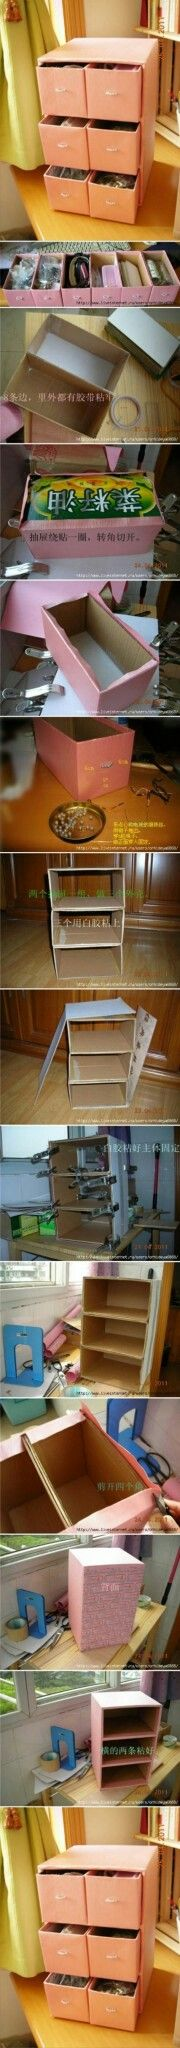 DIY cardboard furniture